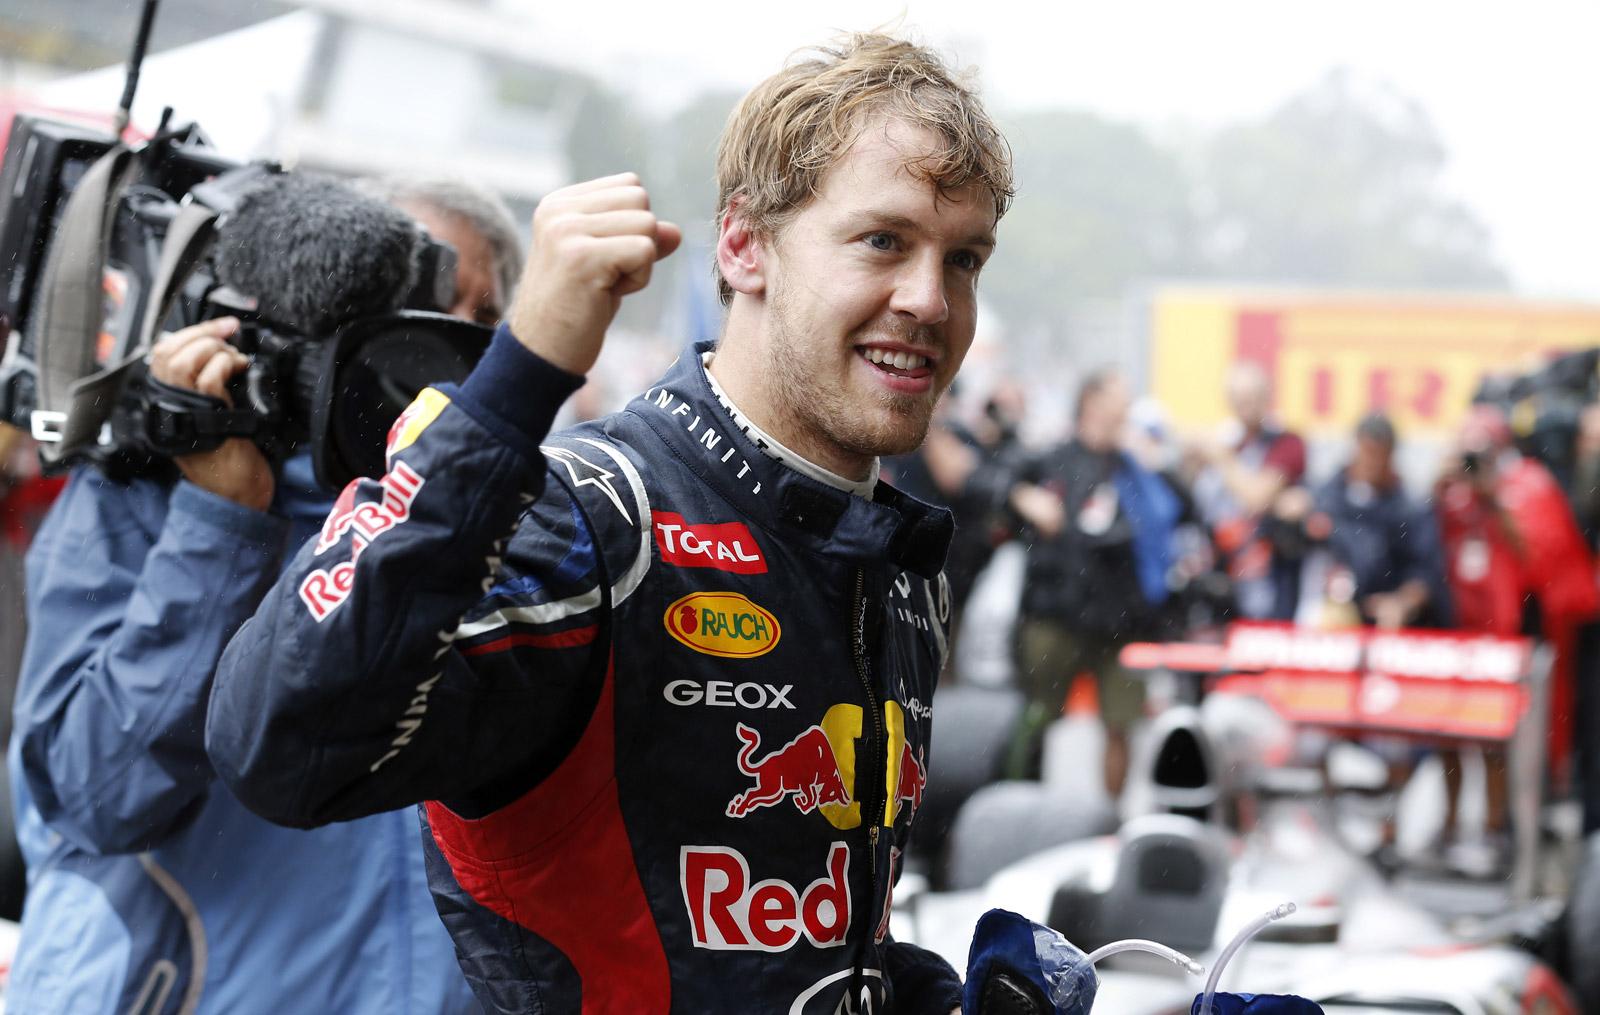 Vettel Picks Up Third F1 World Championship After Brazilian Gp